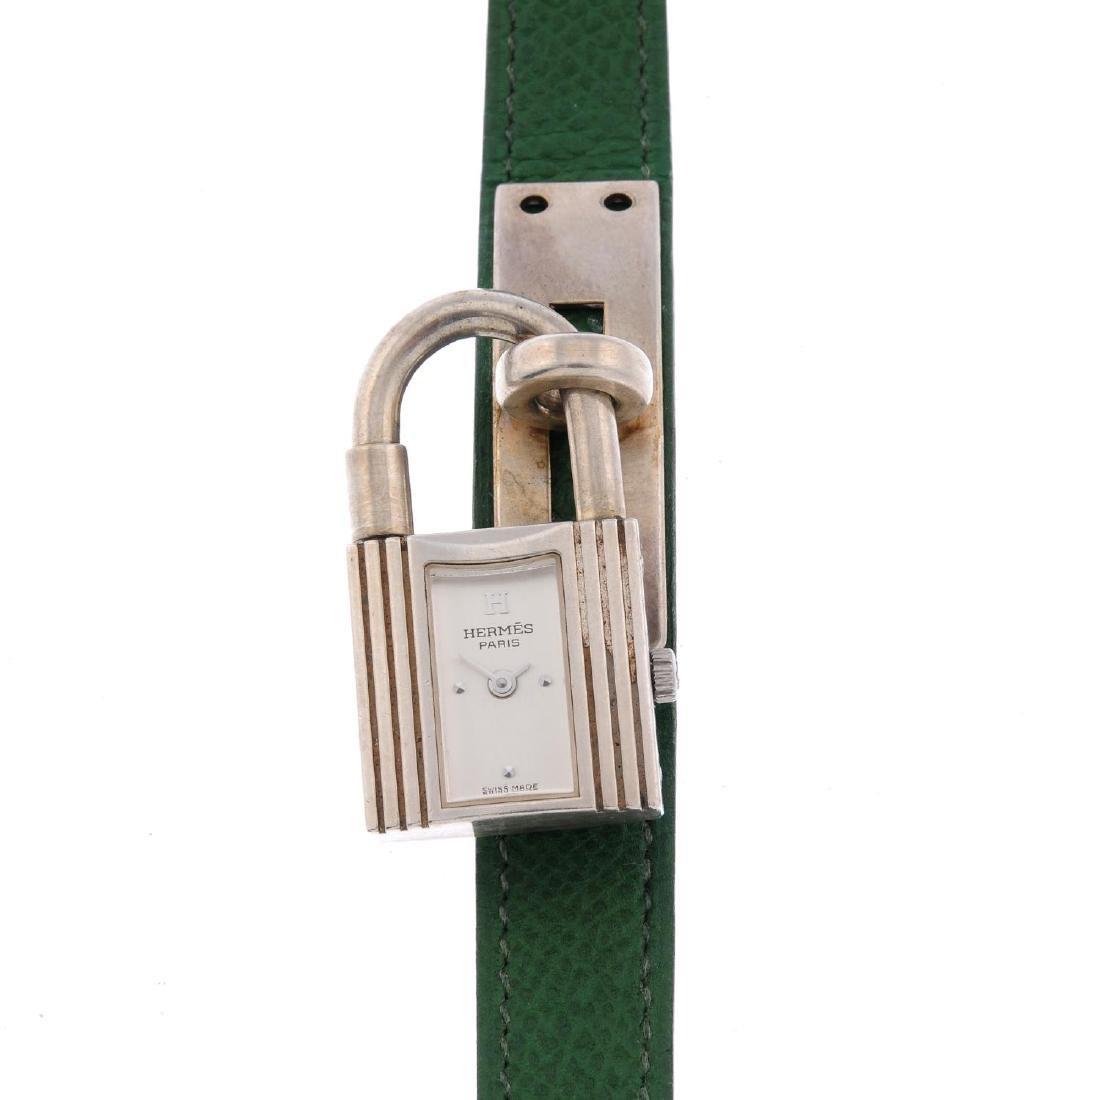 HERMÈS - a lady's Kelly wrist watch. Silver padlock